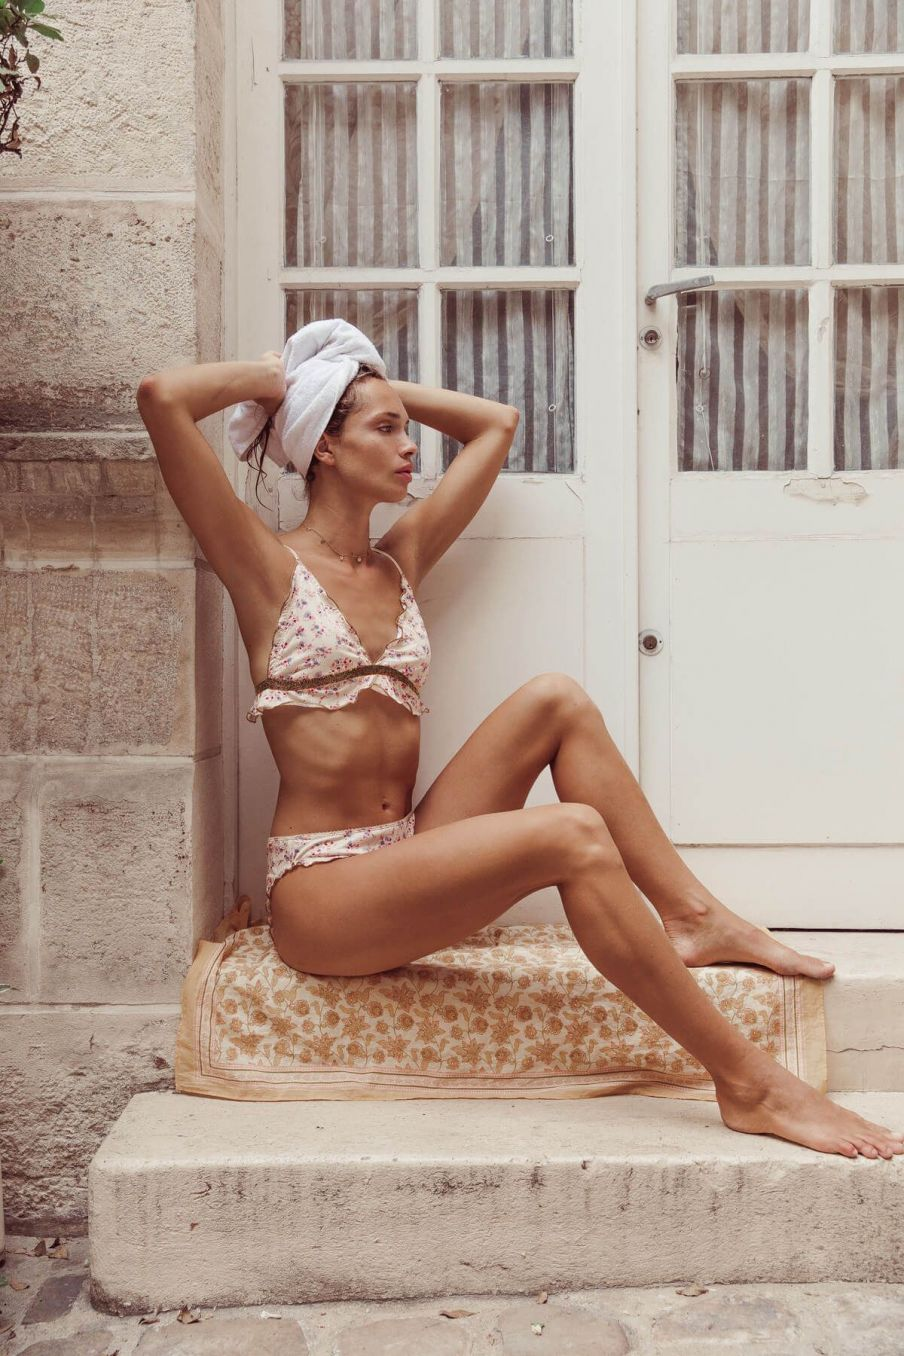 boheme chic vintage soutien-gorge femme yejina cream blossom